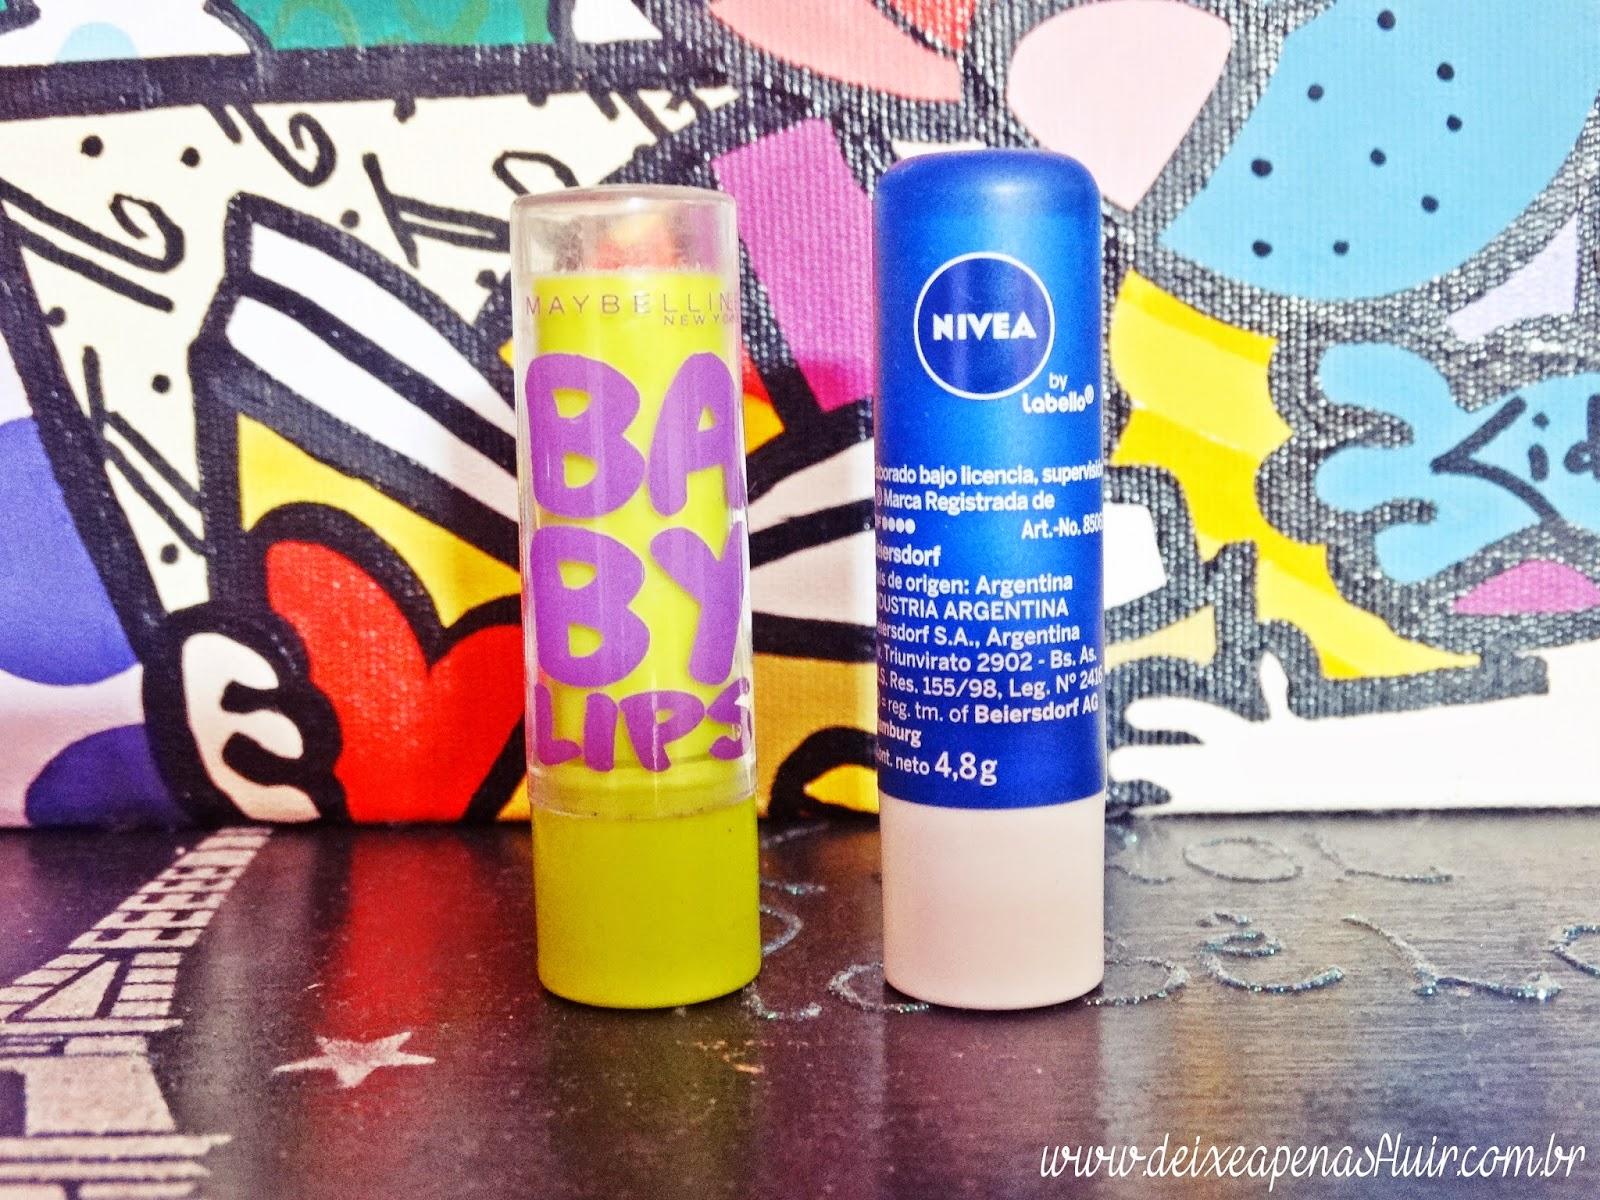 DSC02144 - Batalha dos Lip Balms: Nivea vs Maybelline